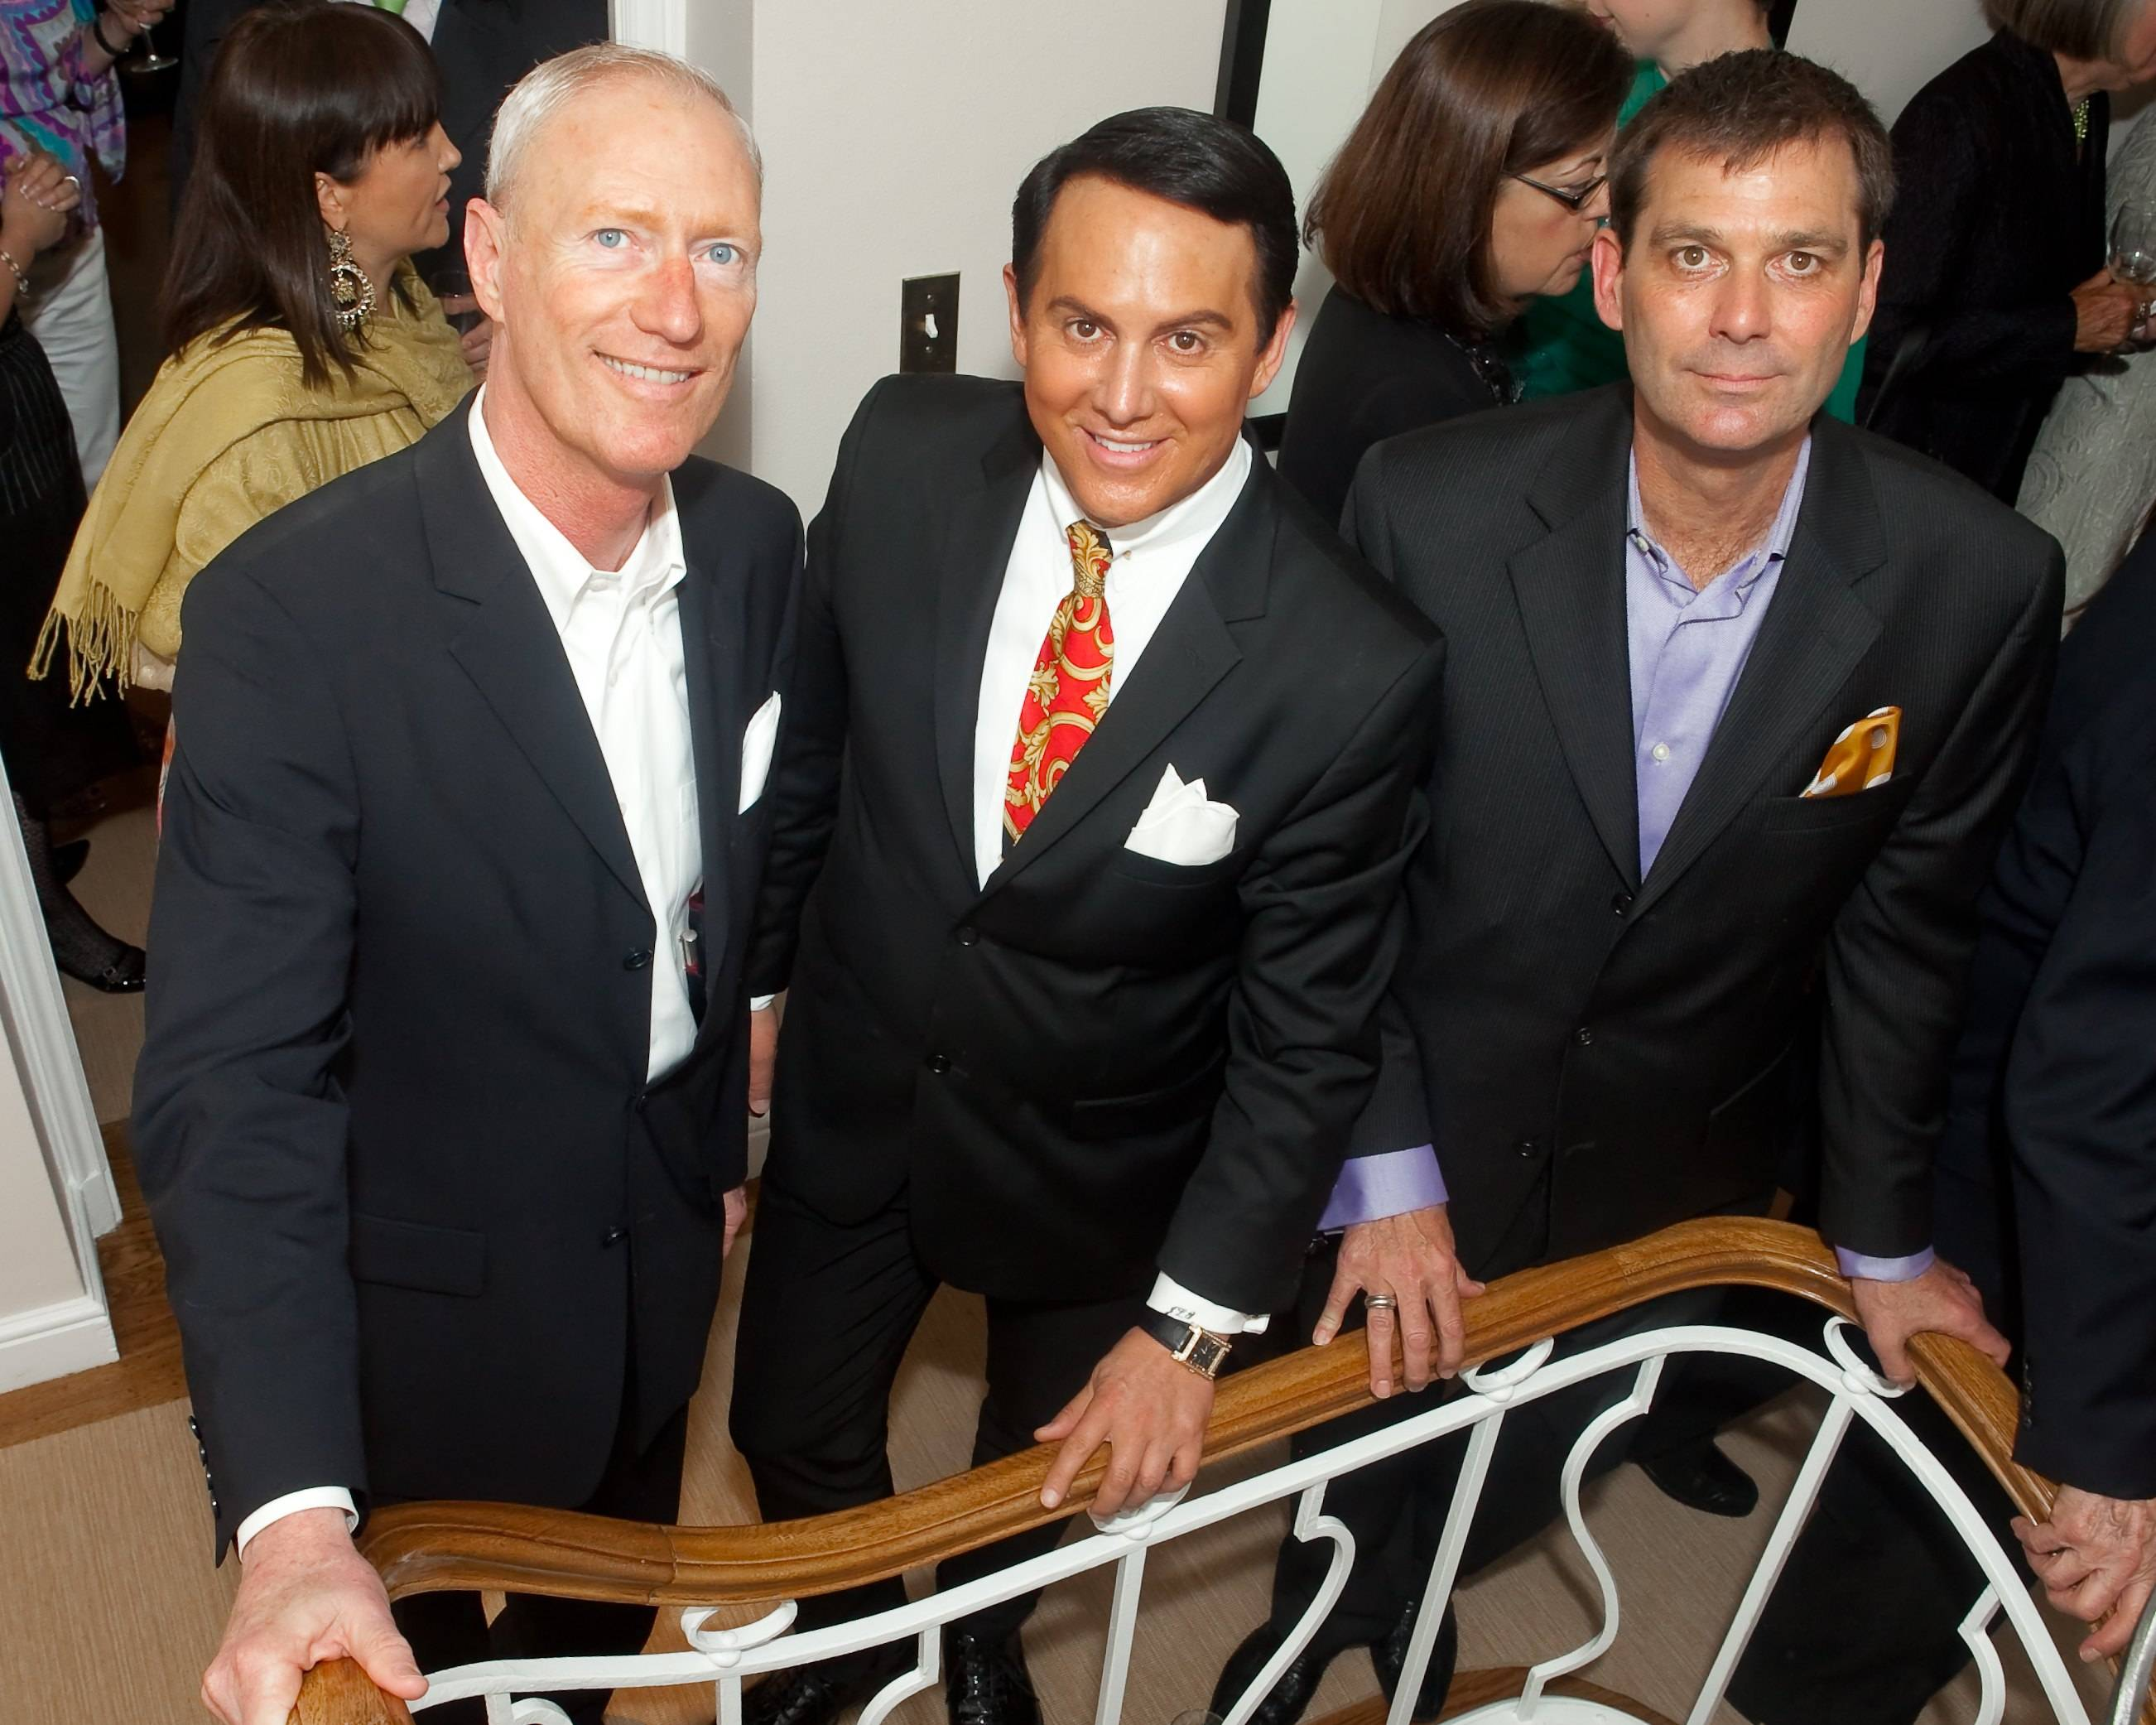 The 2010 San Francisco Decorator Showcase Opening - Haute Living